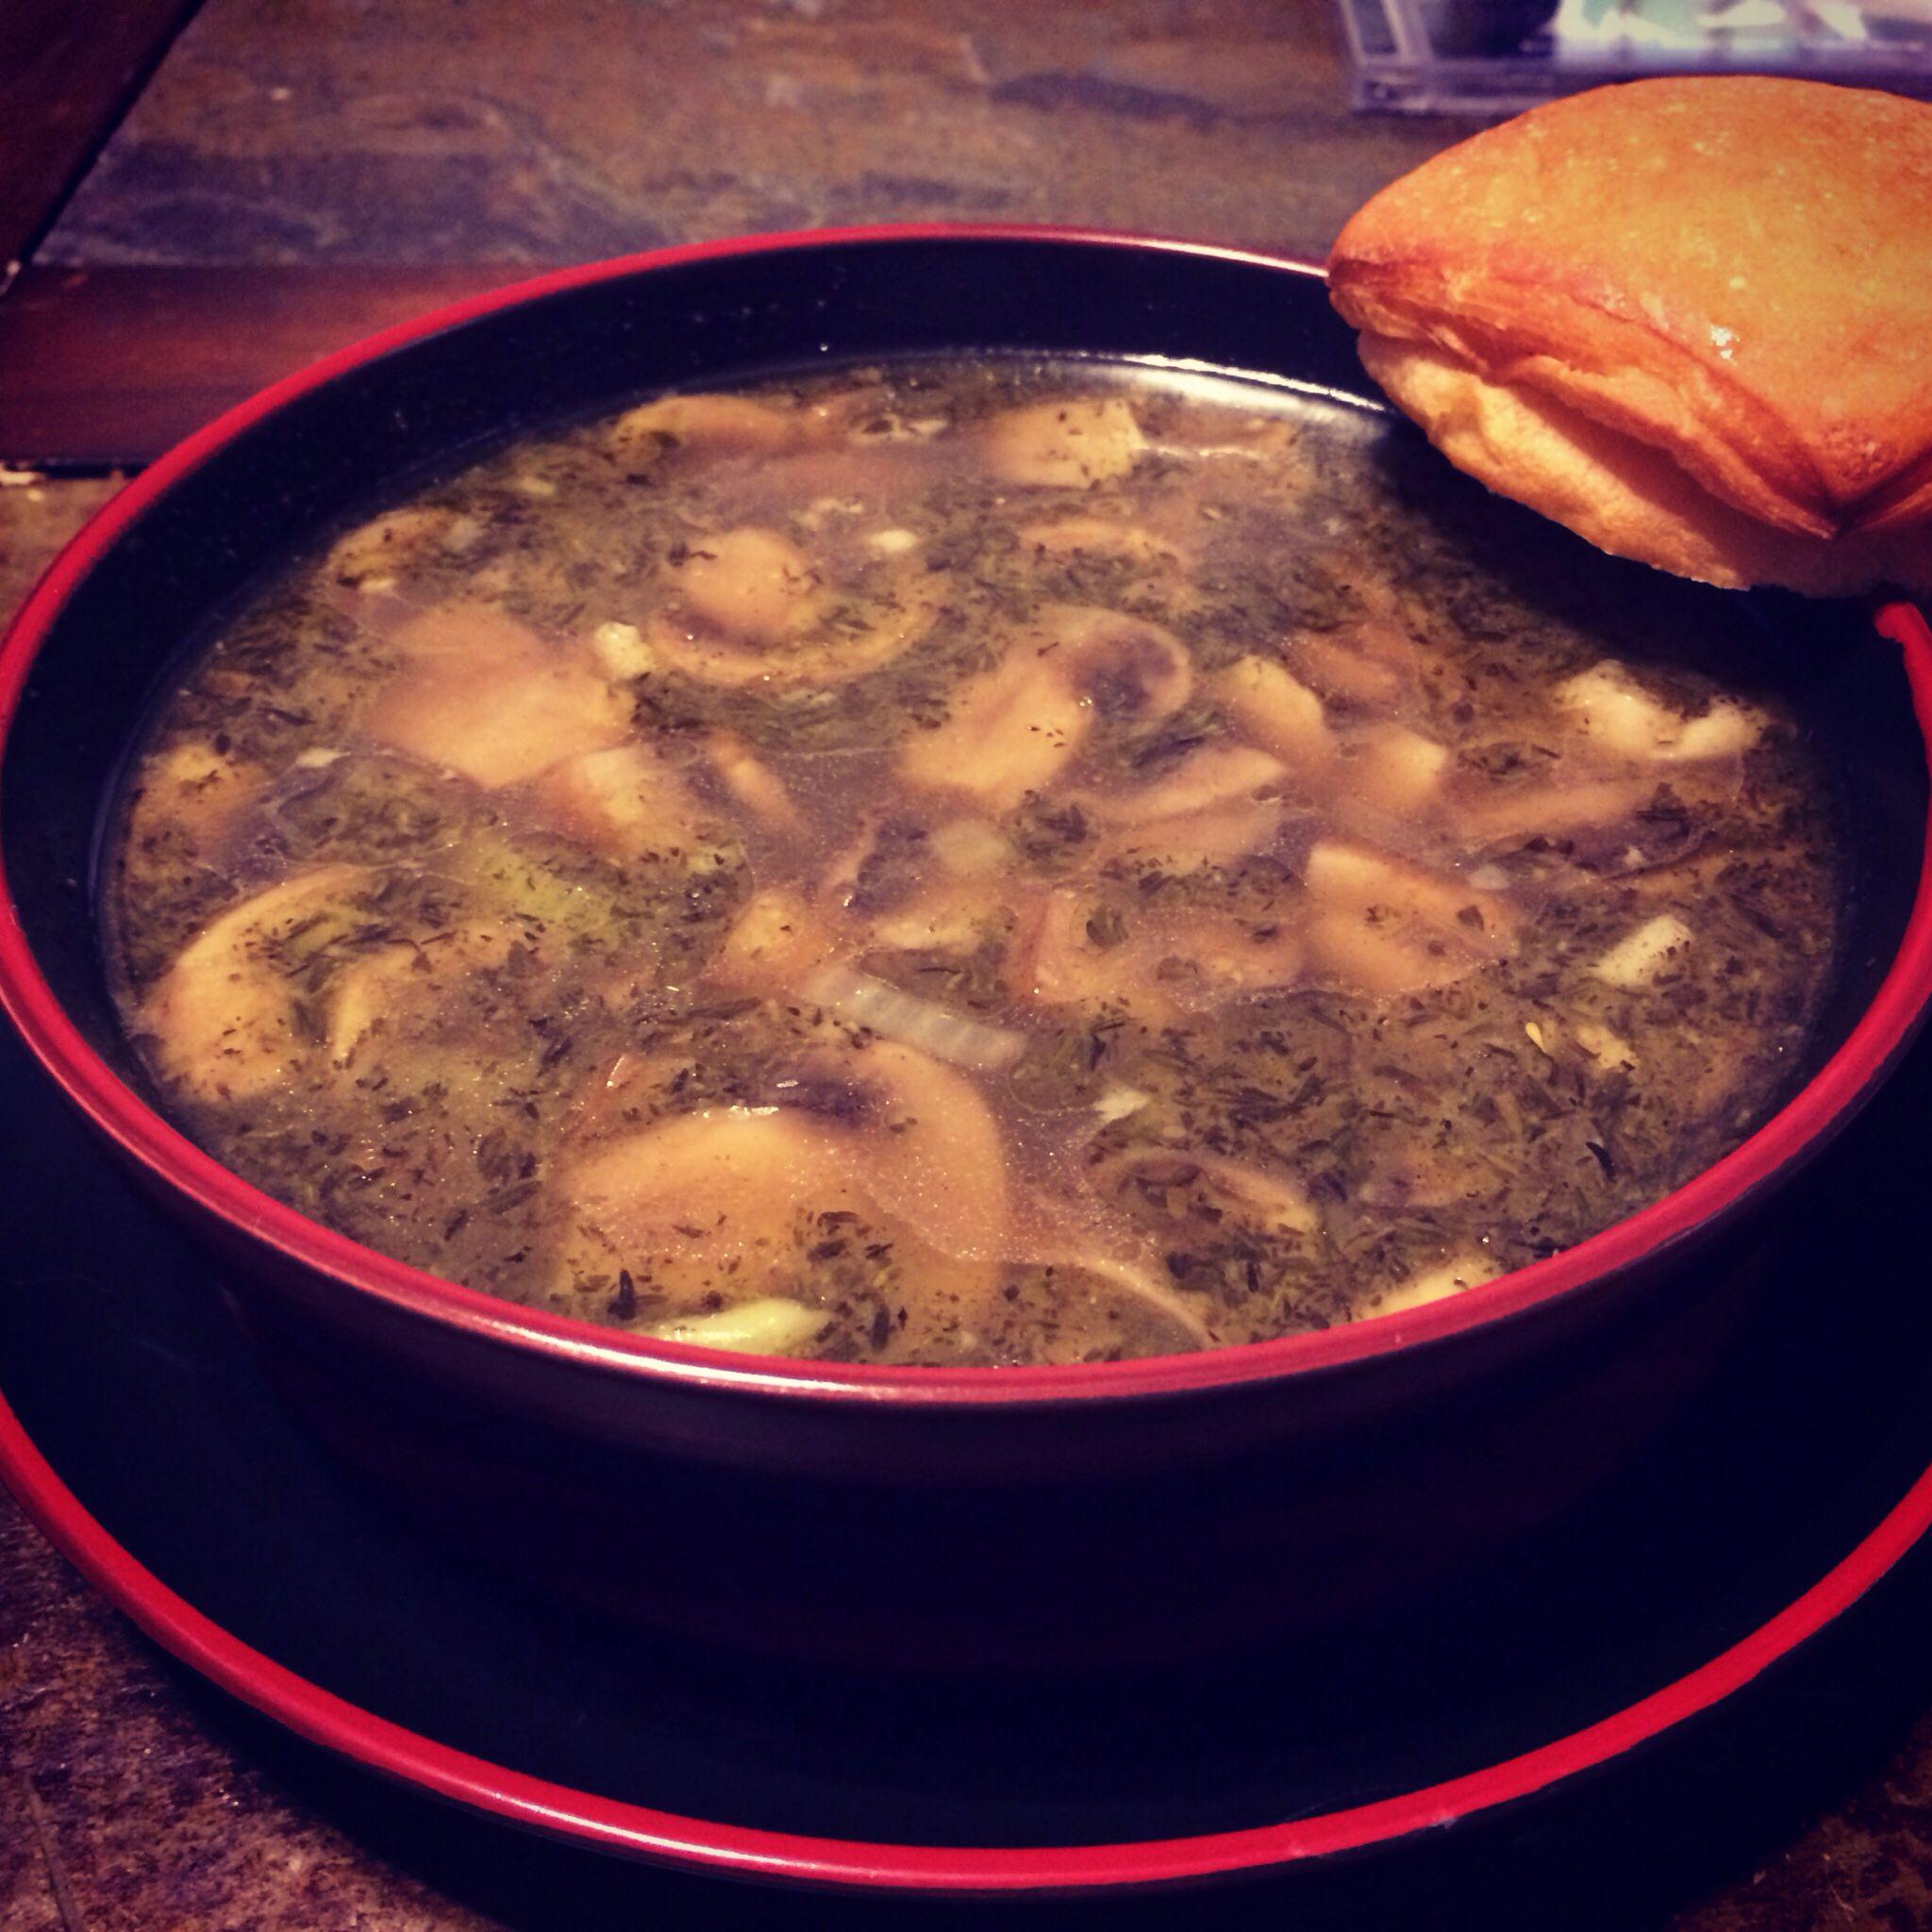 Ham Hock and Mushroom soup